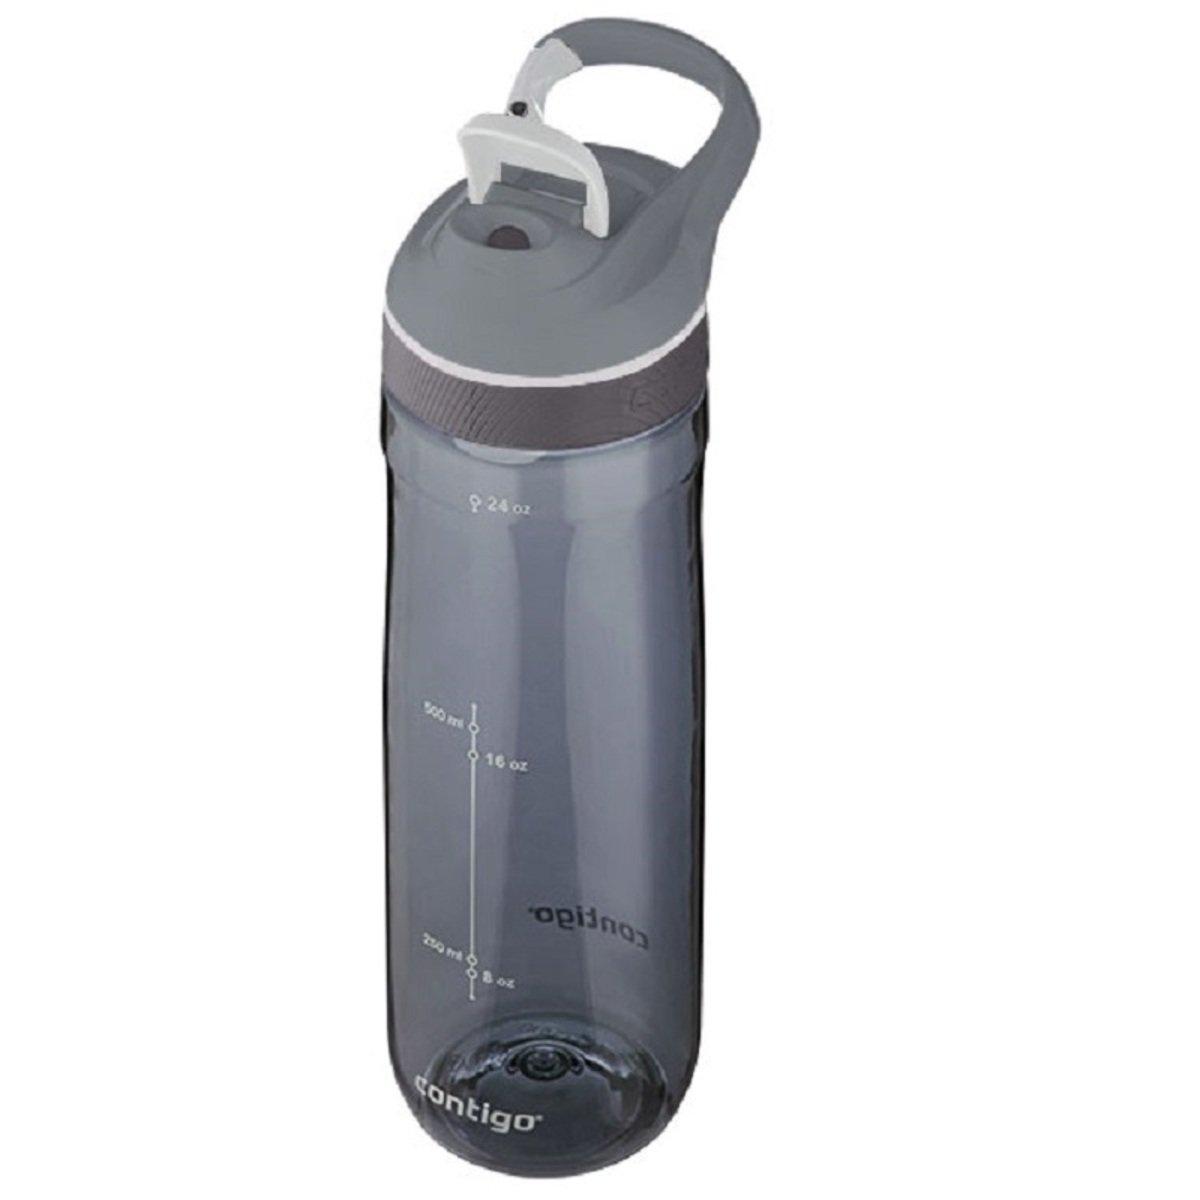 Cortland 運動偷閒杯 - 灰色杯灰色蓋